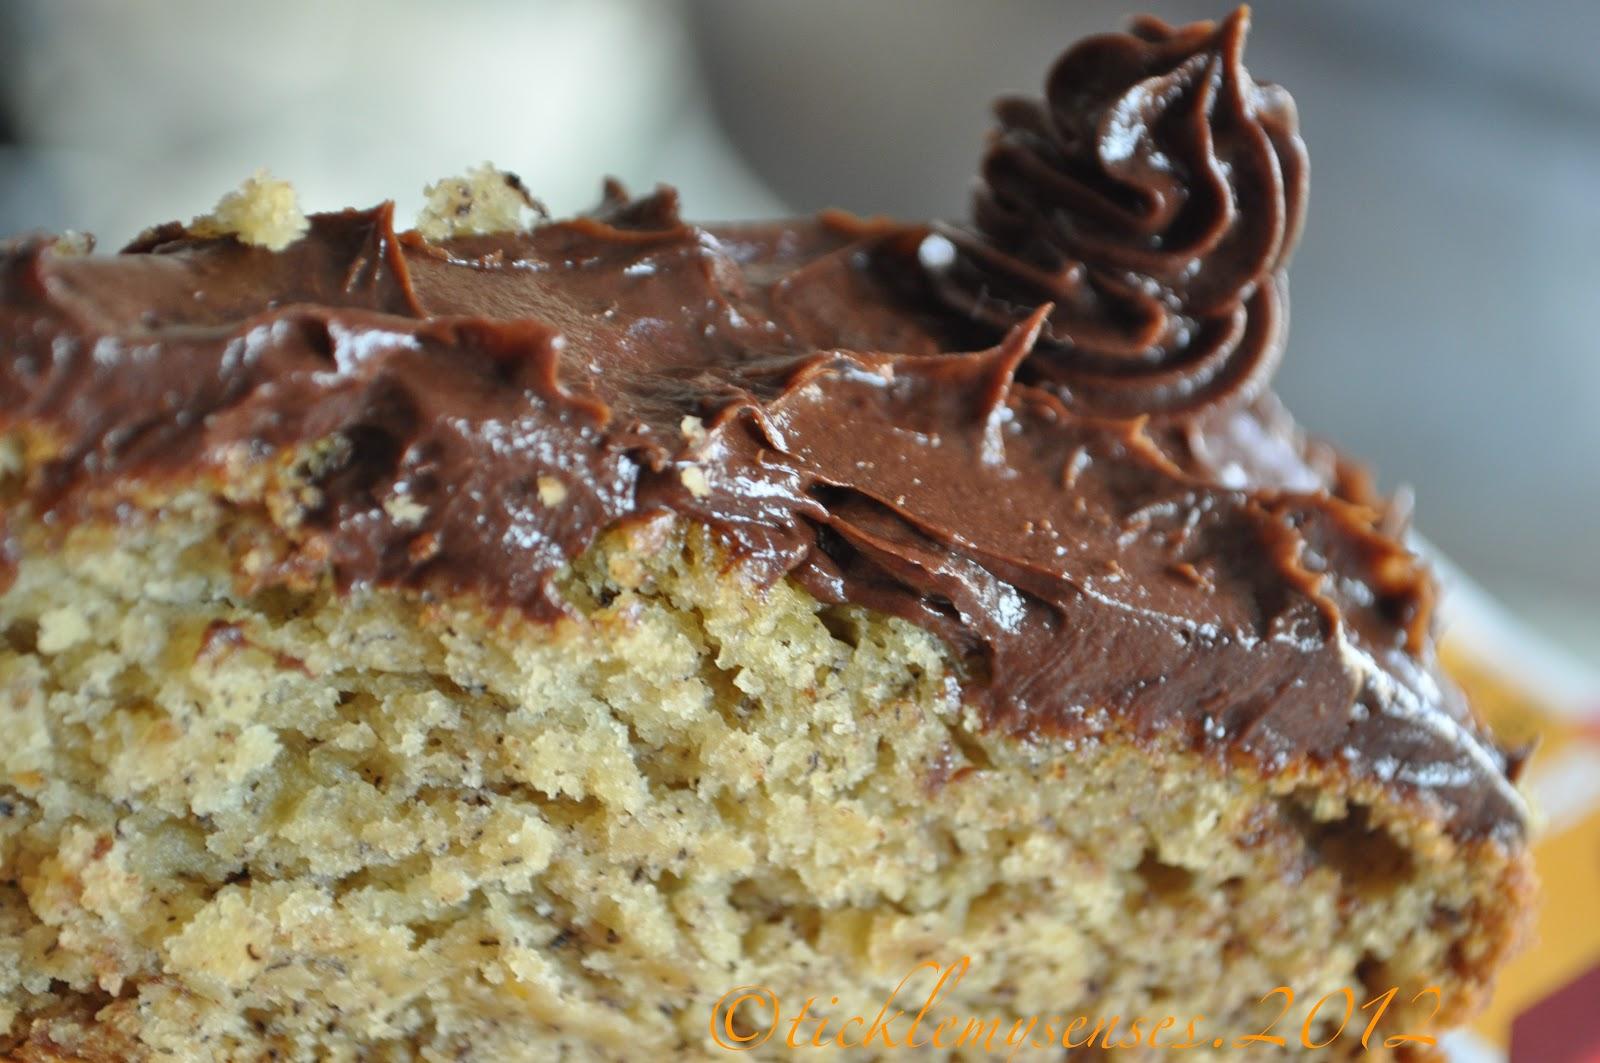 Arabic Chocolate Cake